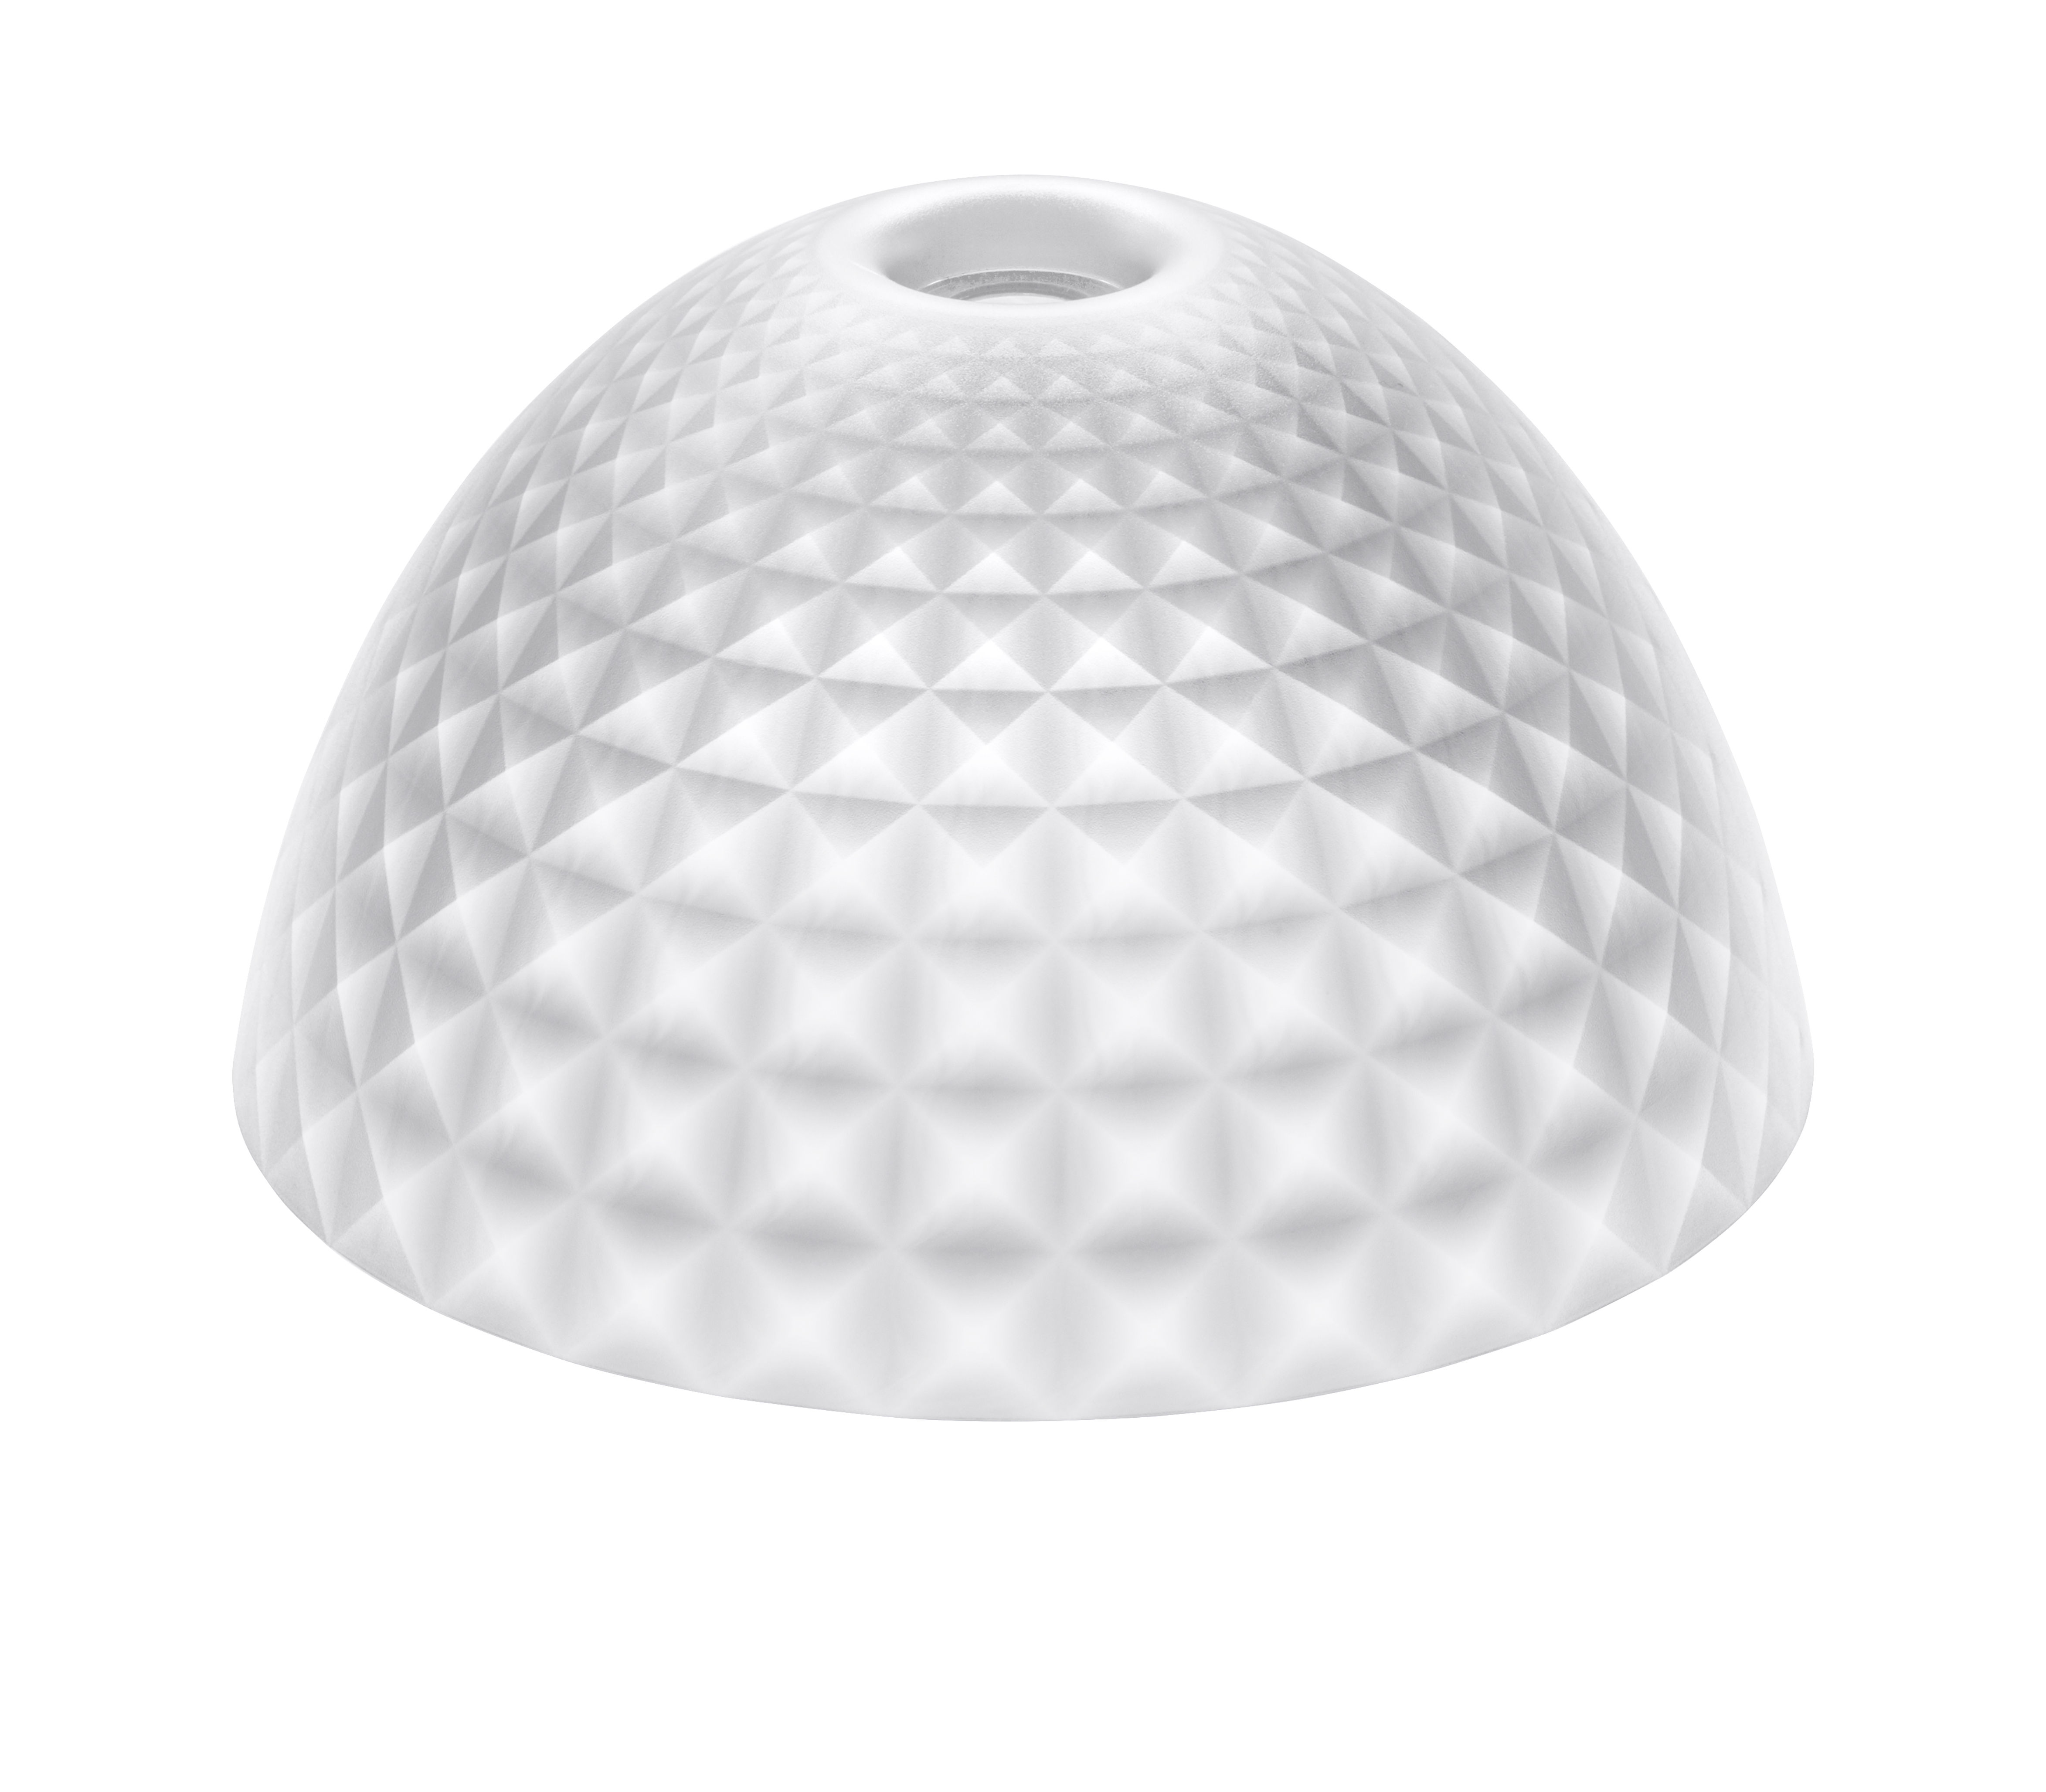 Luminaire - Suspensions - Abat-jour Stella  Medium / Ø 43,5 cm - Koziol - Transparent - Polyéthylène